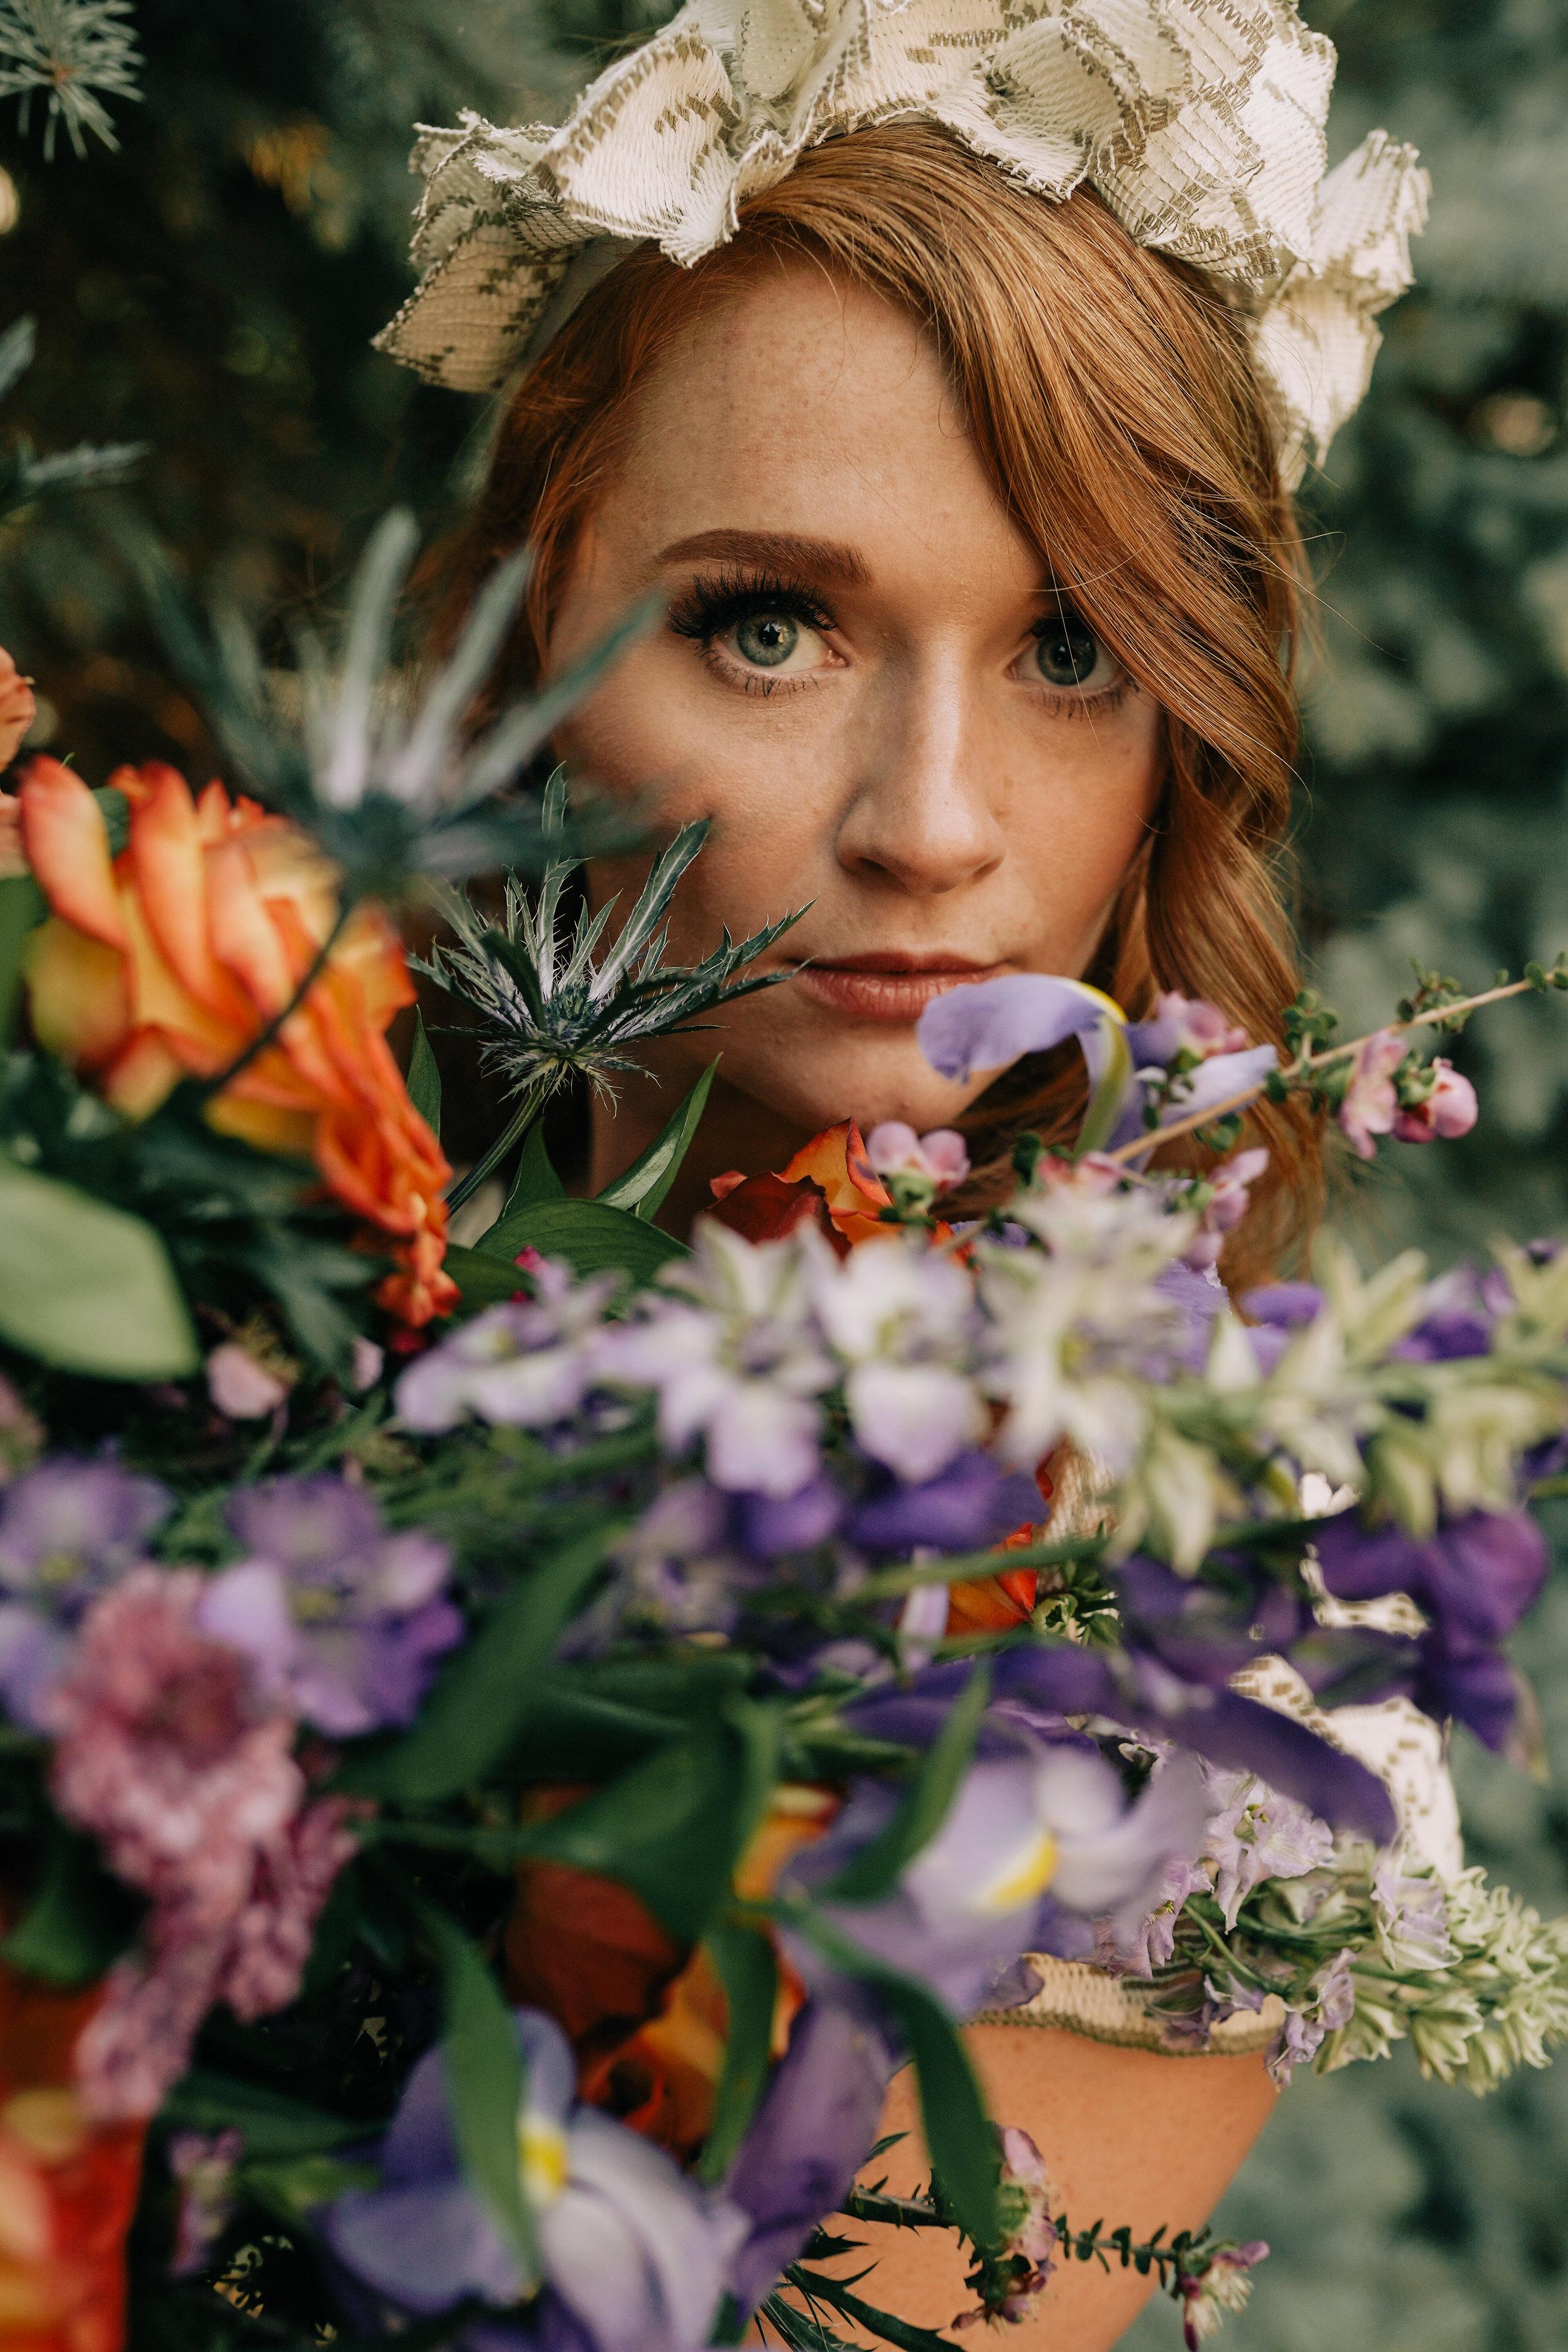 myrtle-mae-iris-aisle-dame-maiden-lavender-blue-floral-raelyn-ramey-photography-45.jpg